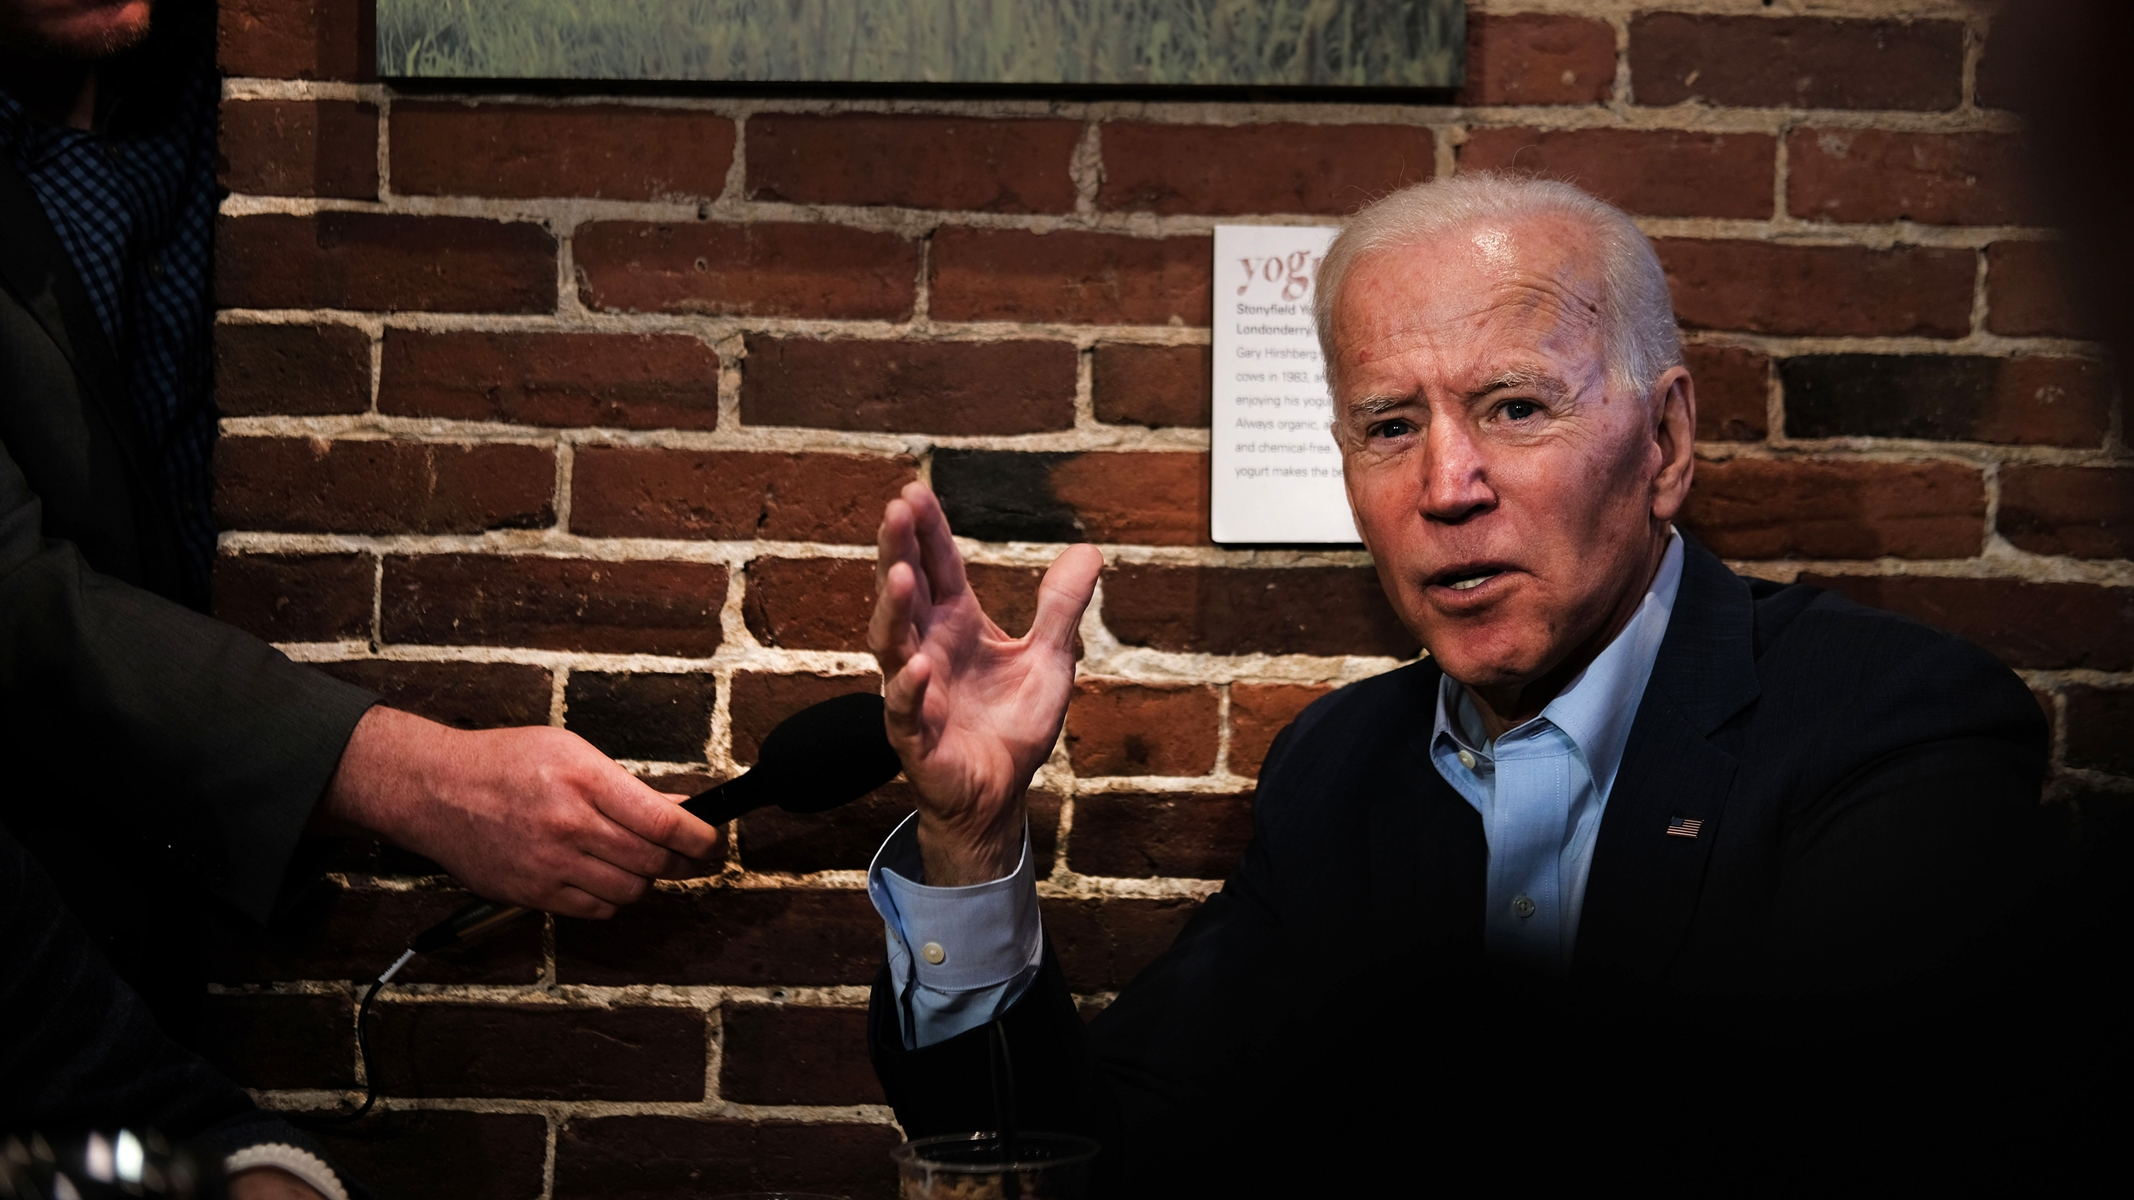 Joe Biden Is Running the Most Radical Campaign of Any Democrat